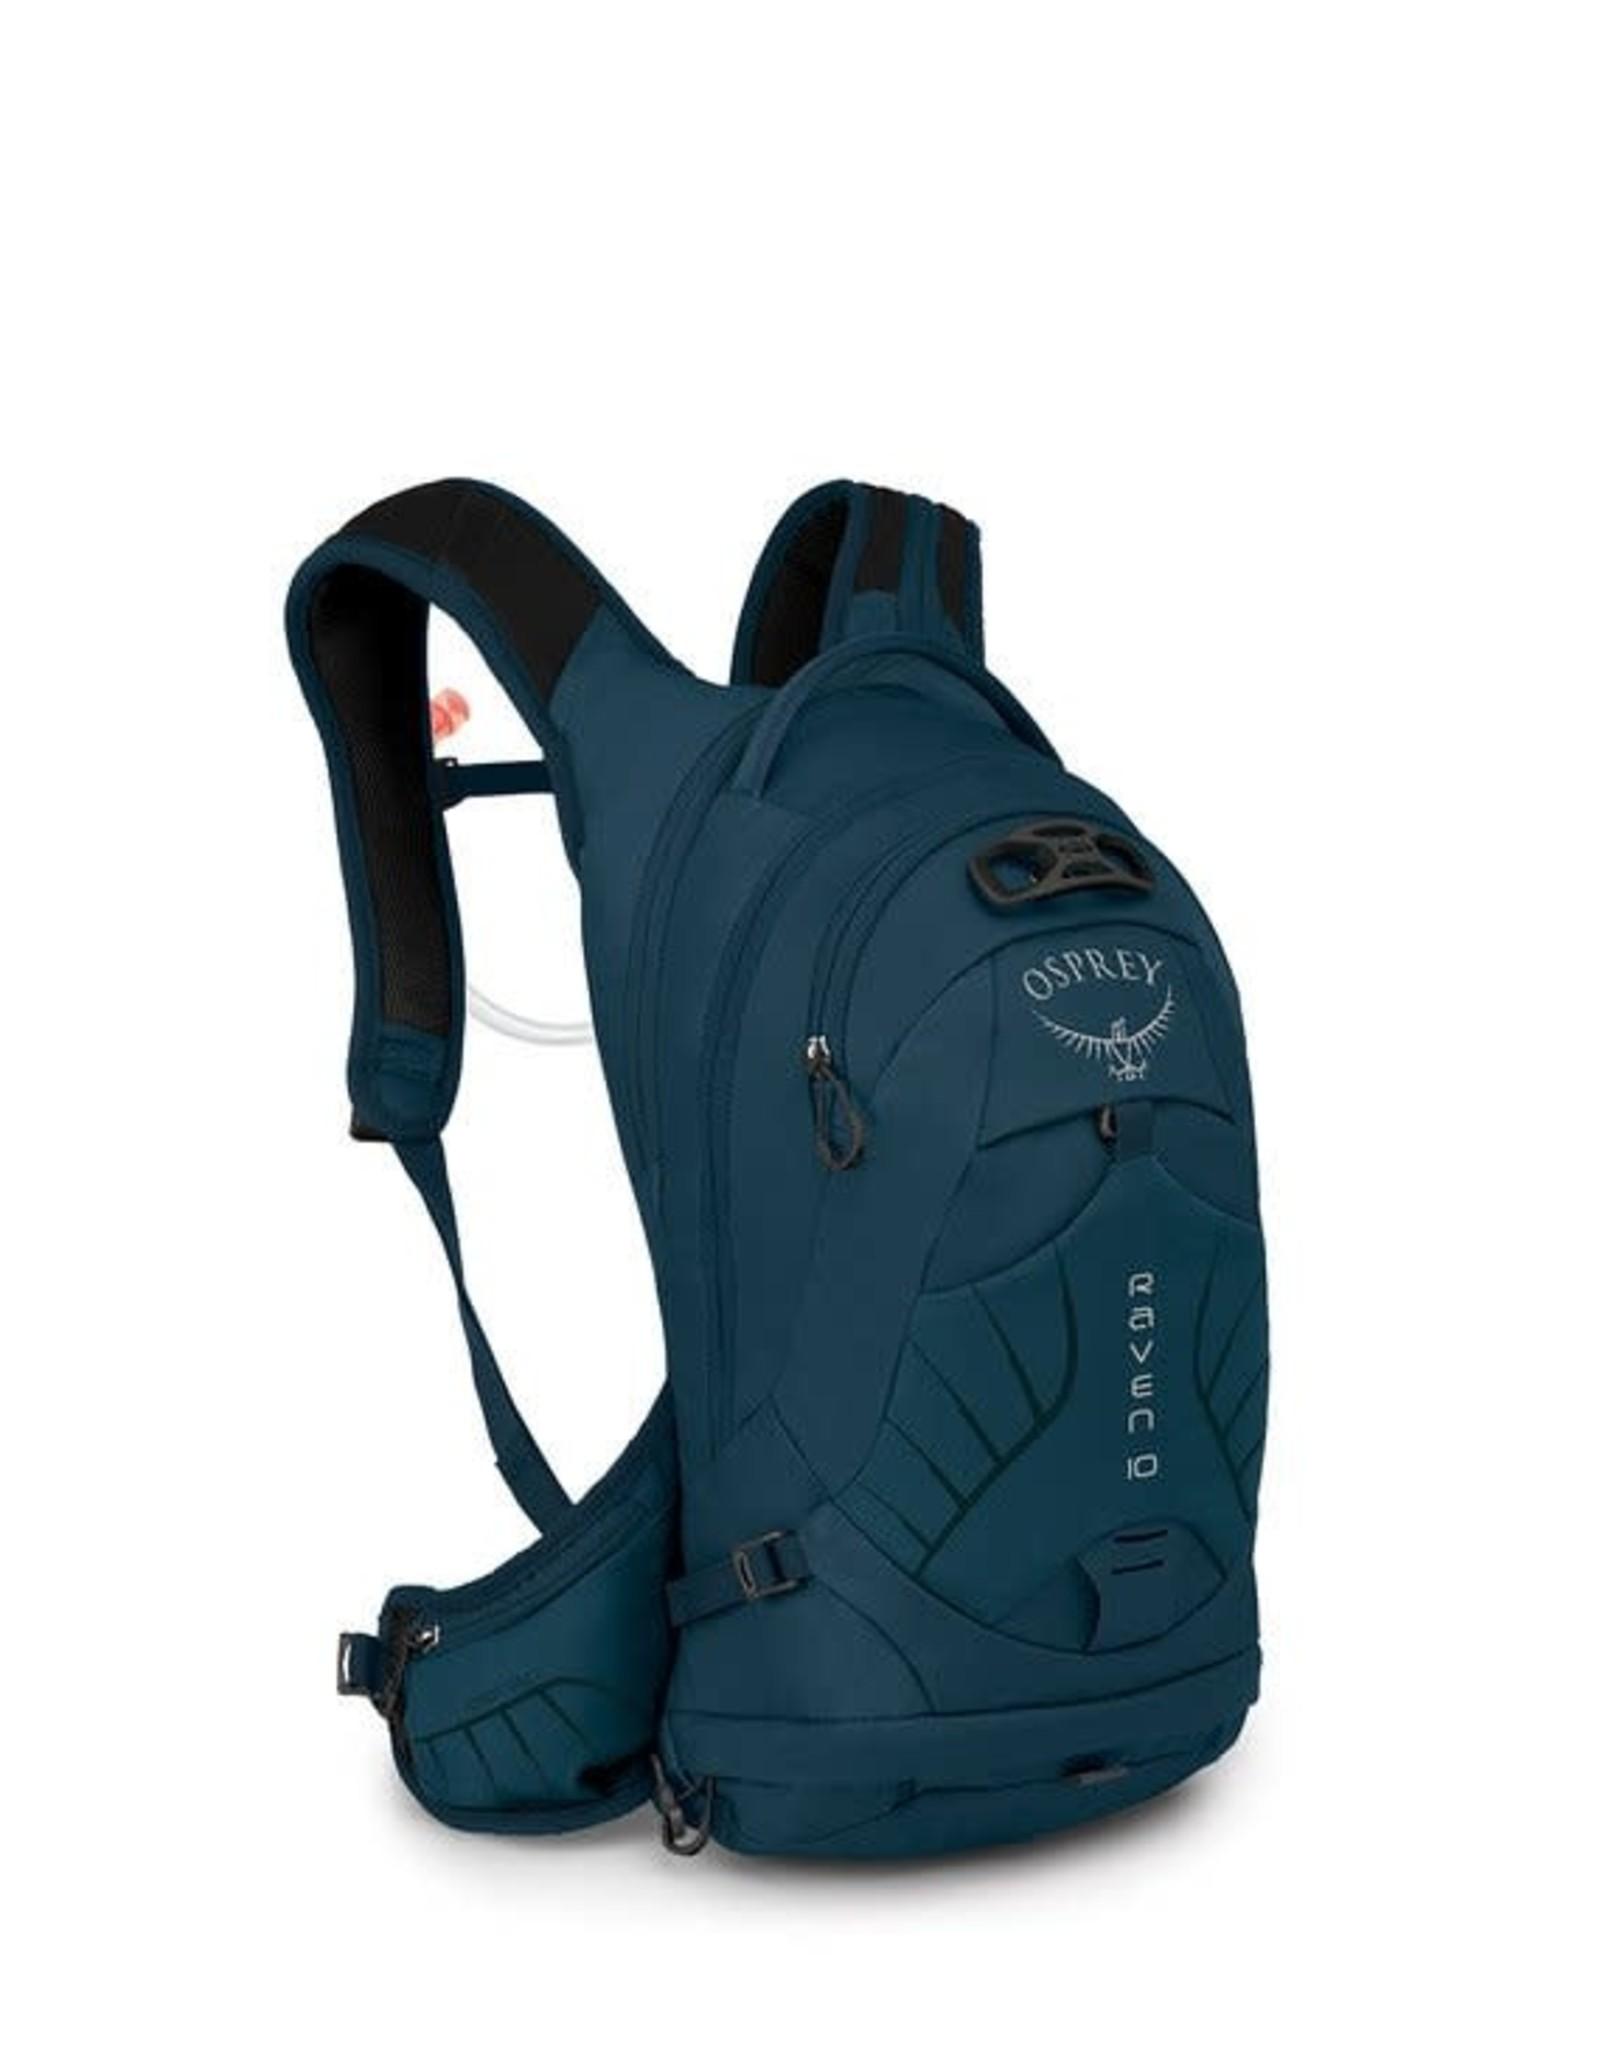 Osprey Osprey Raven 10 Women's Hydration Pack: Blue Emerald